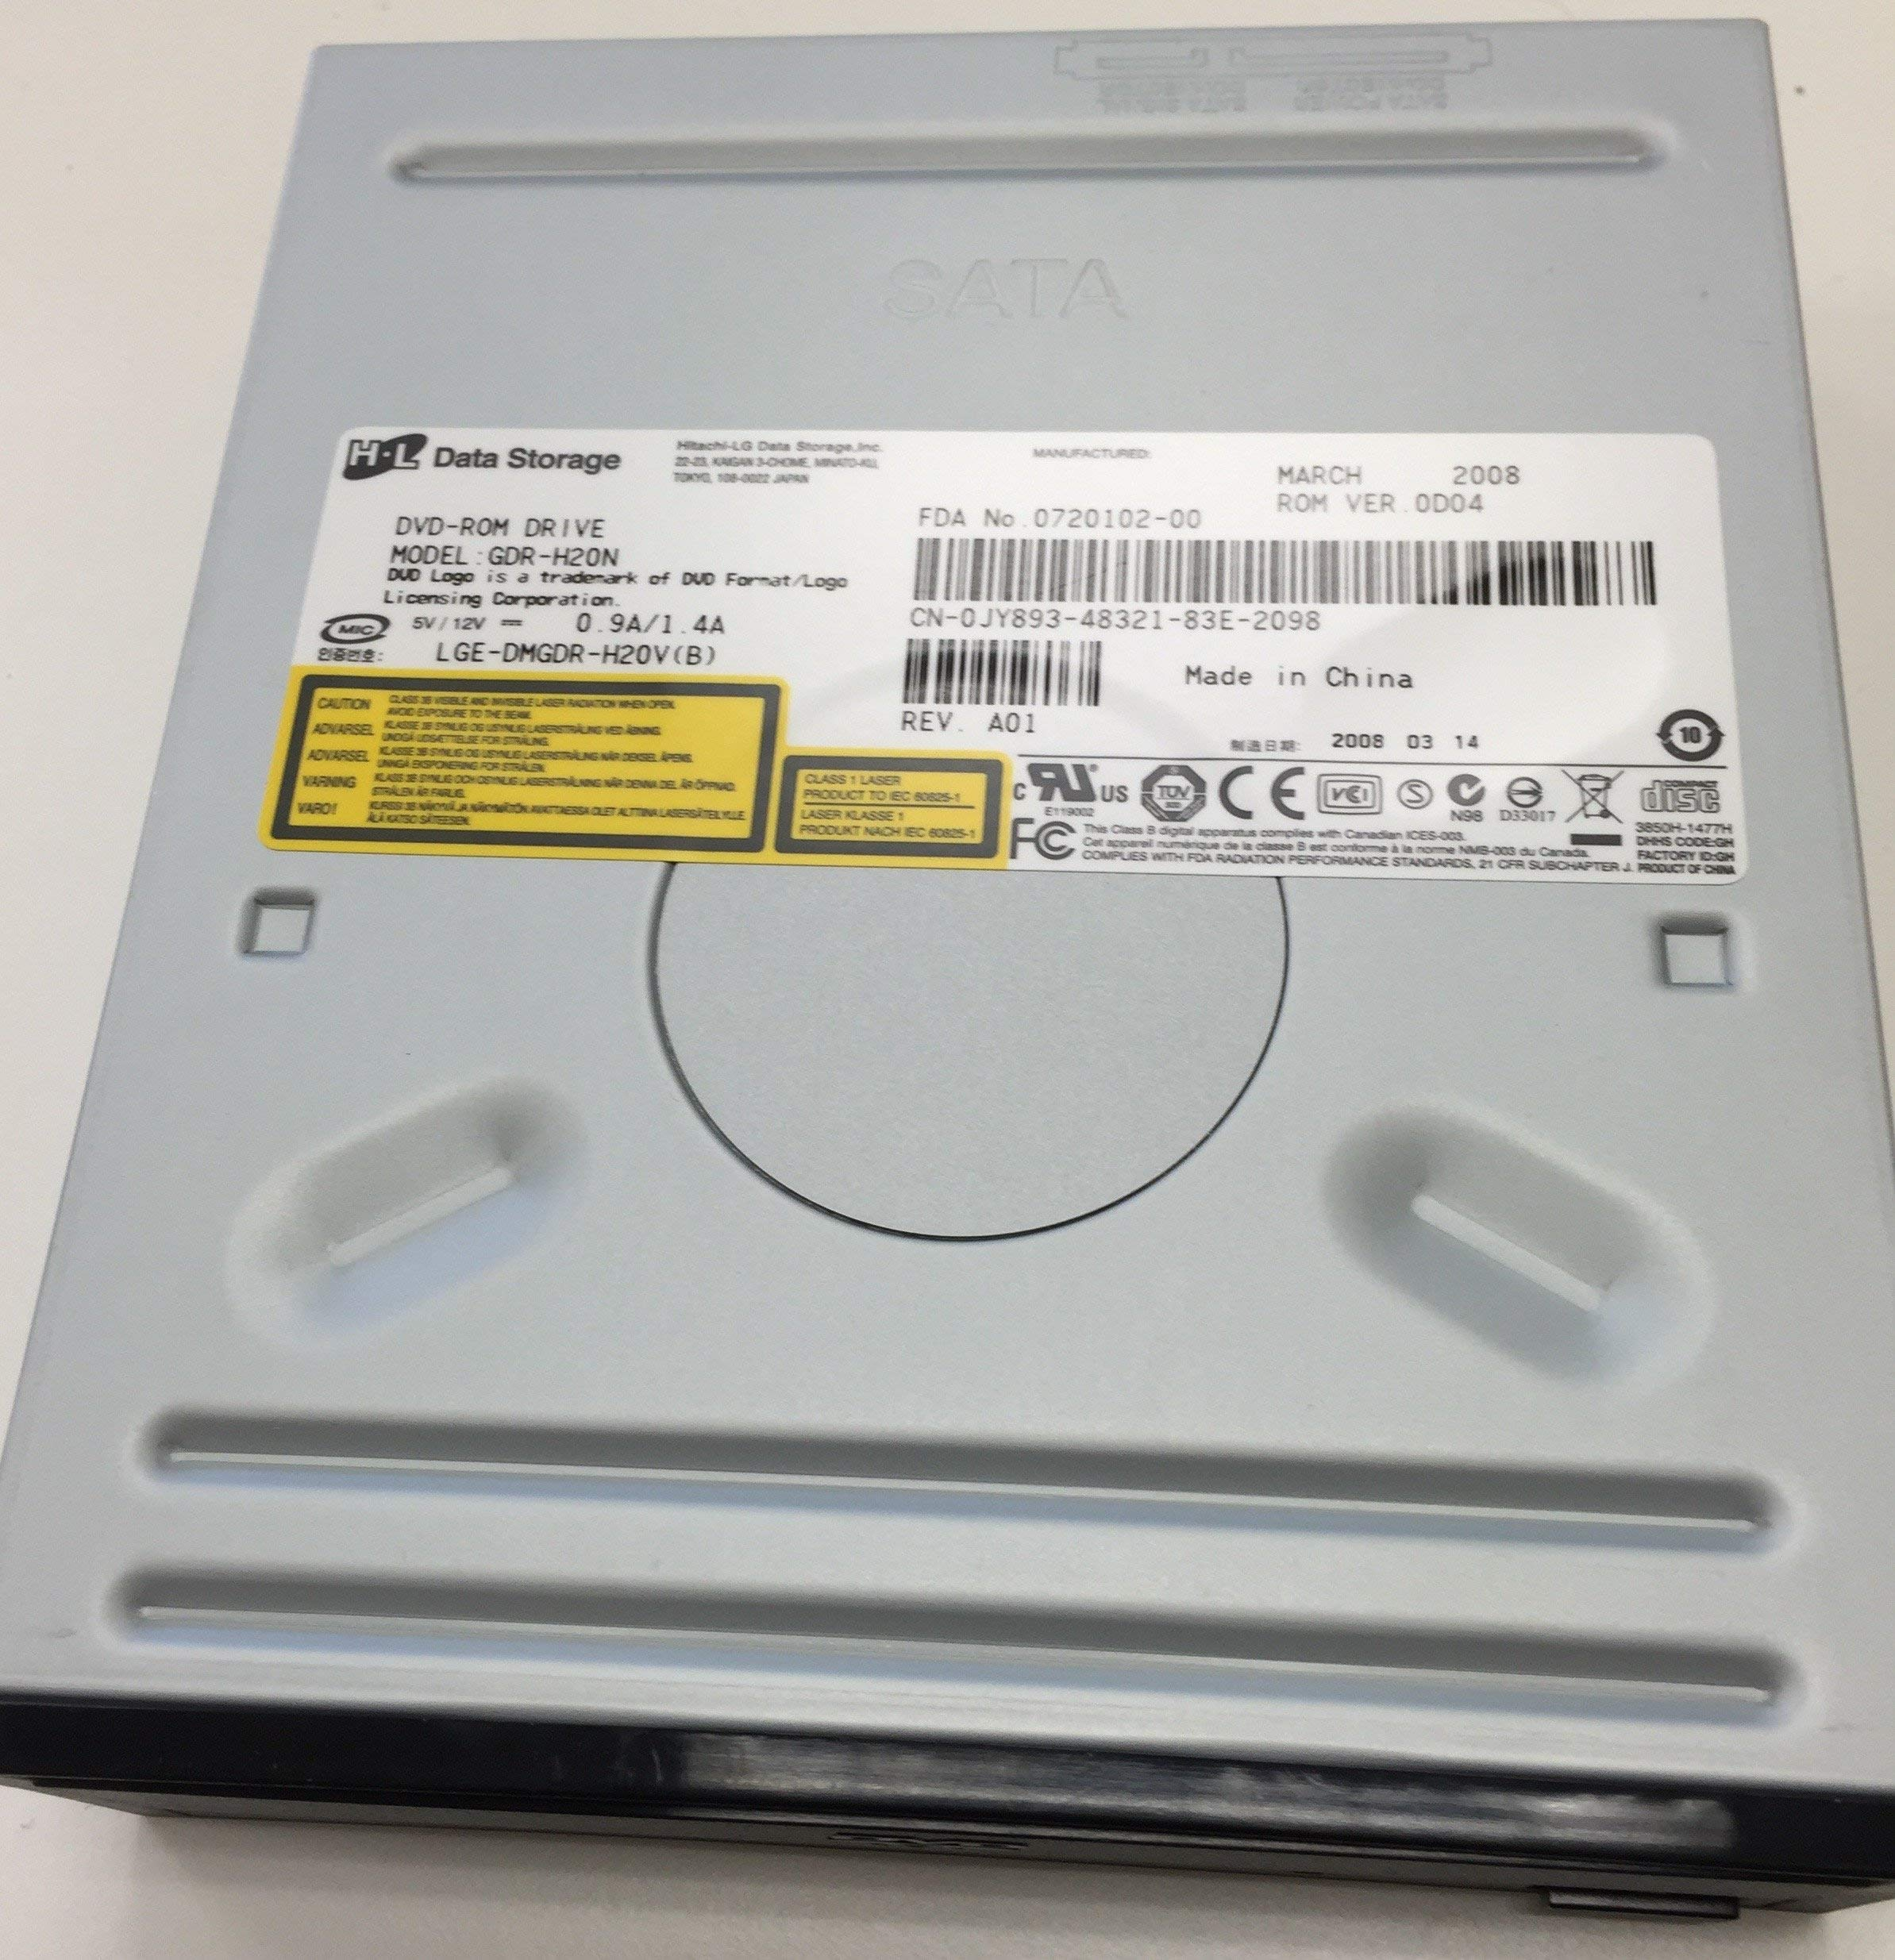 LG GDR-H20N 16x DVD-ROM SATA Drive (Black) (Certified Refurbished)